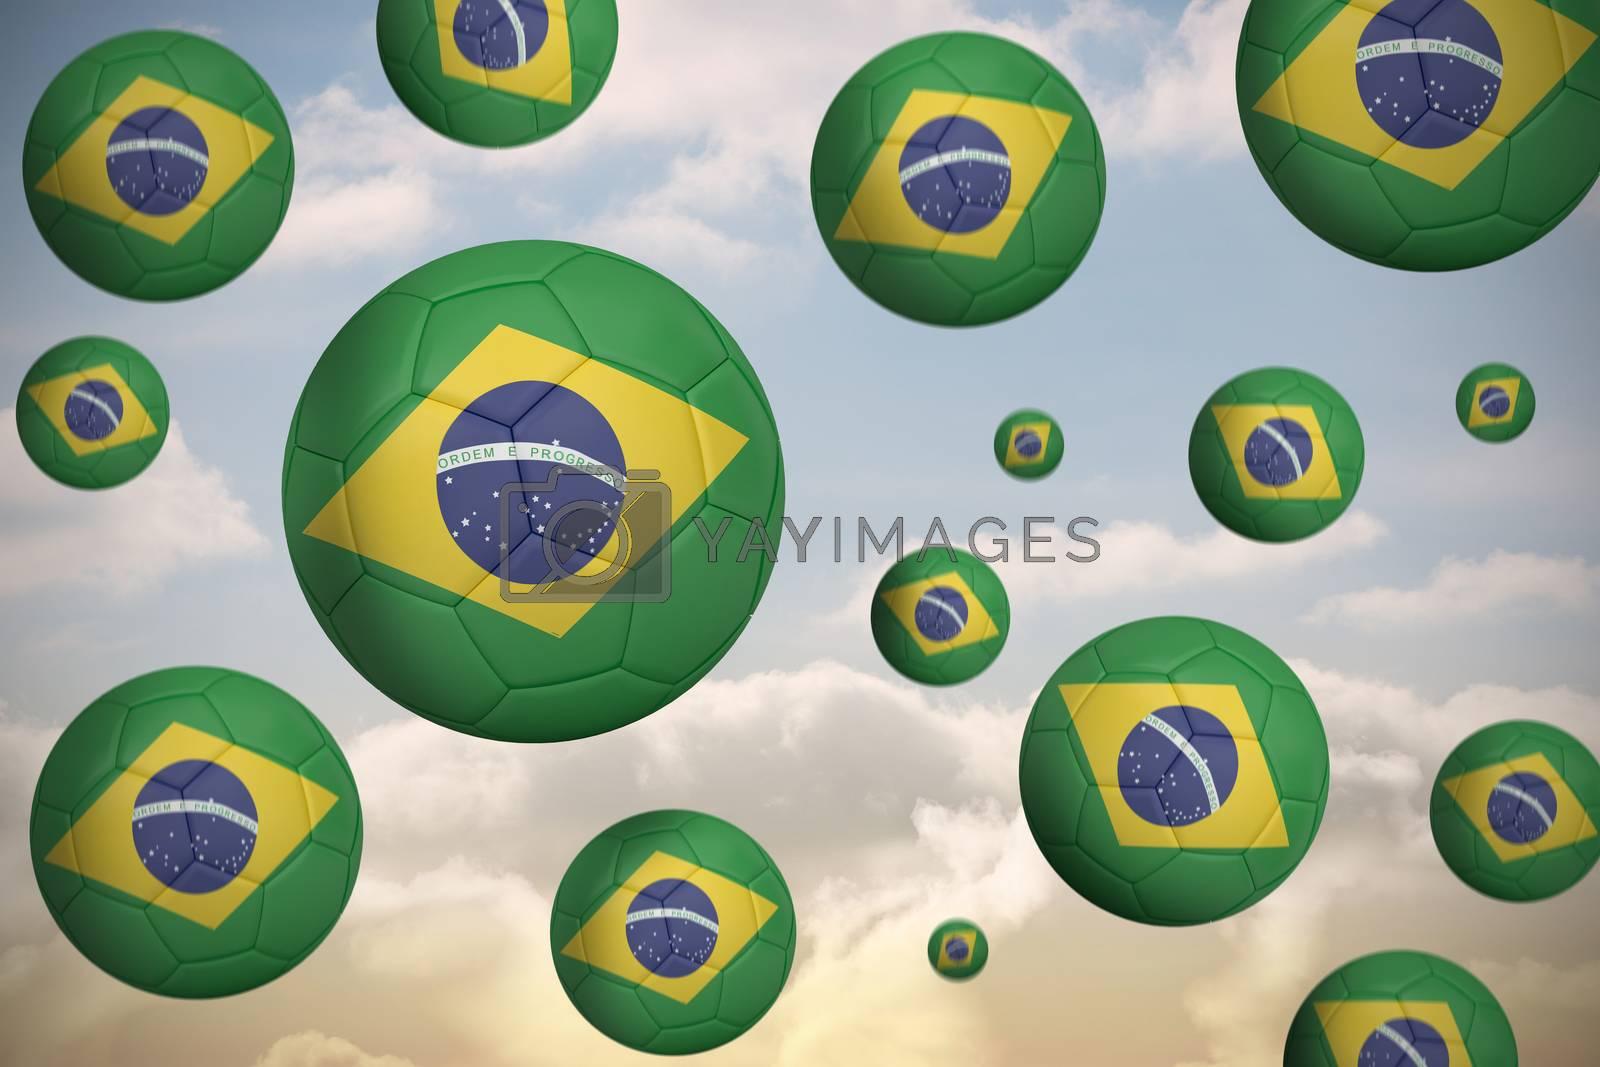 Footballs in brasil flag colours  by Wavebreakmedia